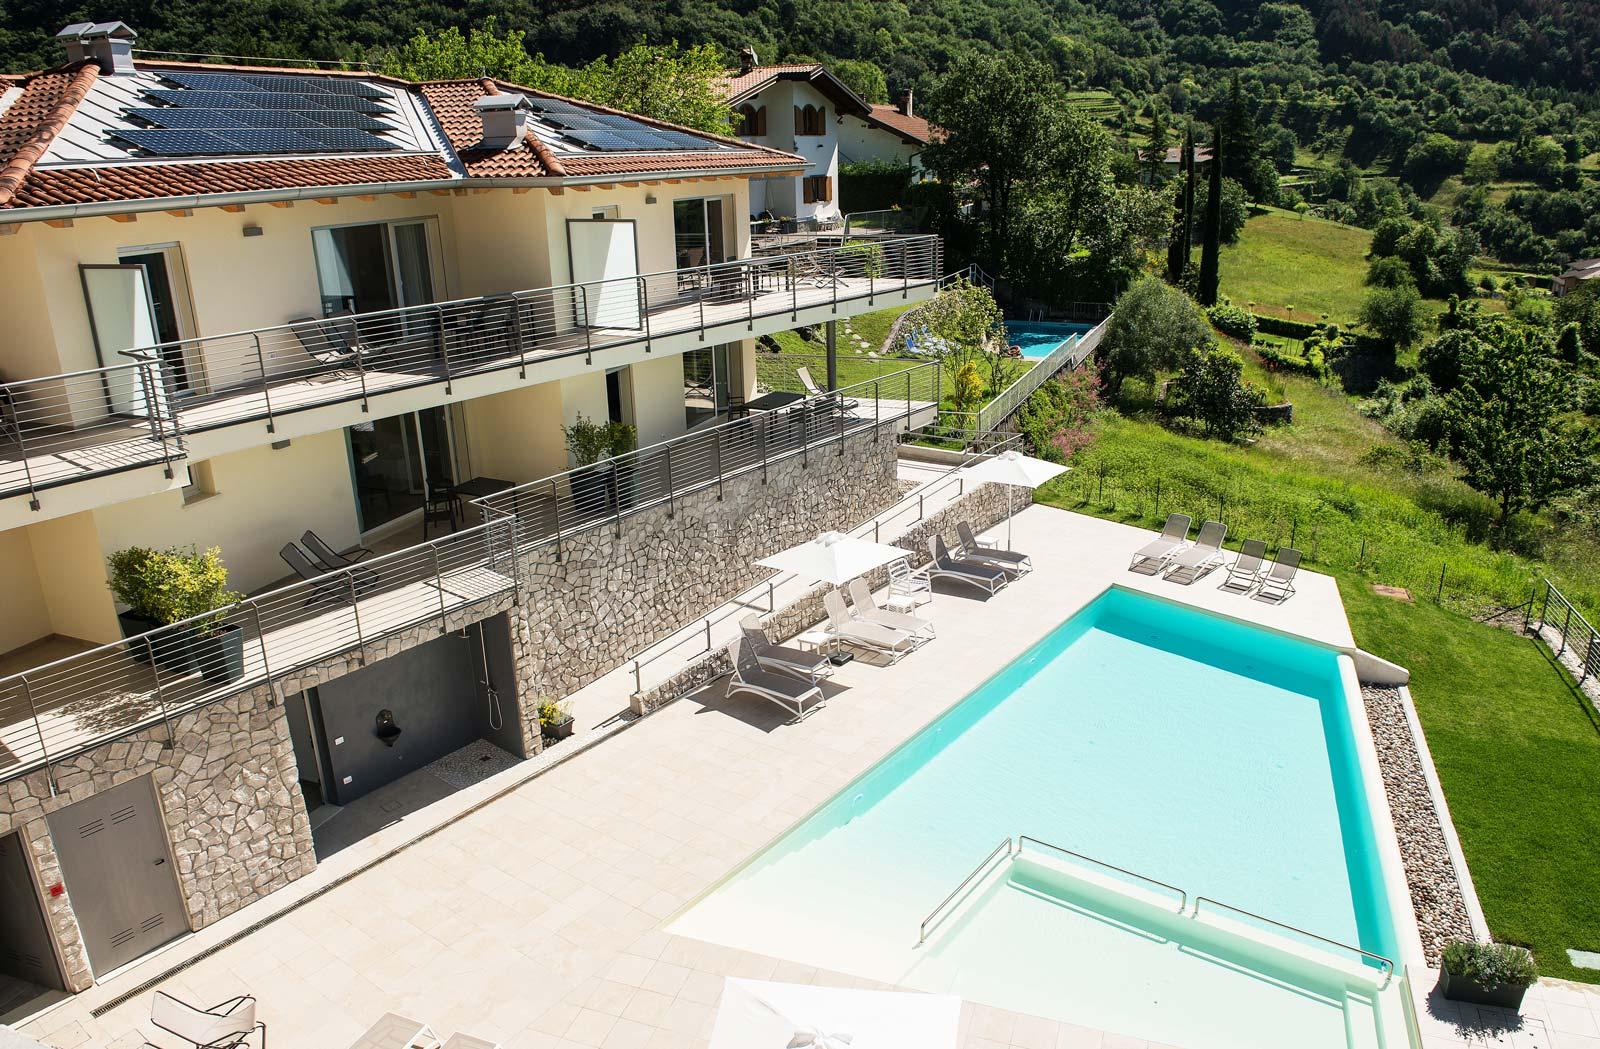 Homepage-Terrazze sul Garda - Terrazze sul Garda - Residence Riva ...